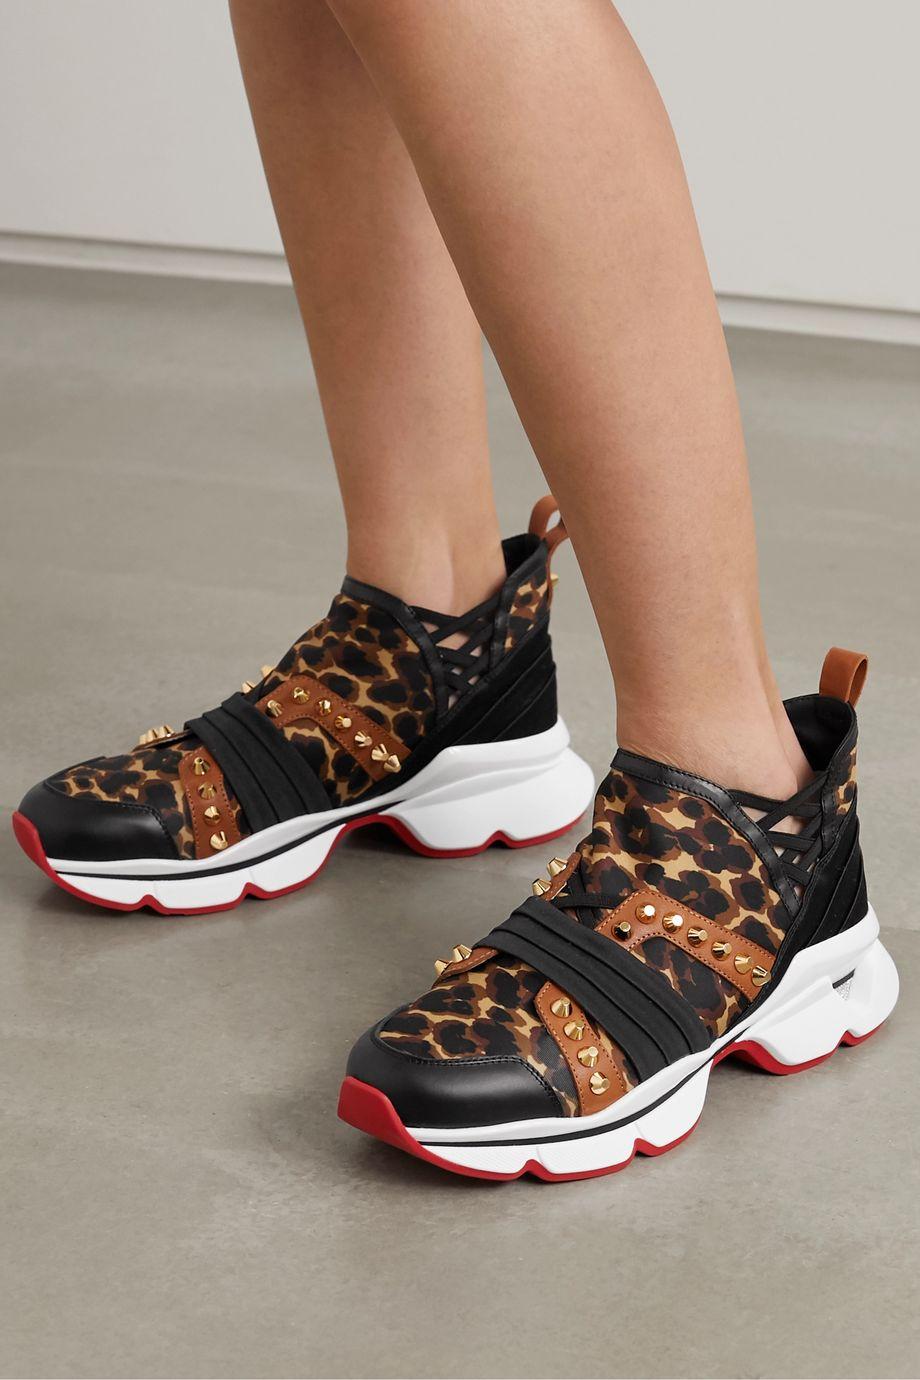 Christian Louboutin 123 Run spiked leopard-print neoprene, leather, satin and grosgrain sneakers